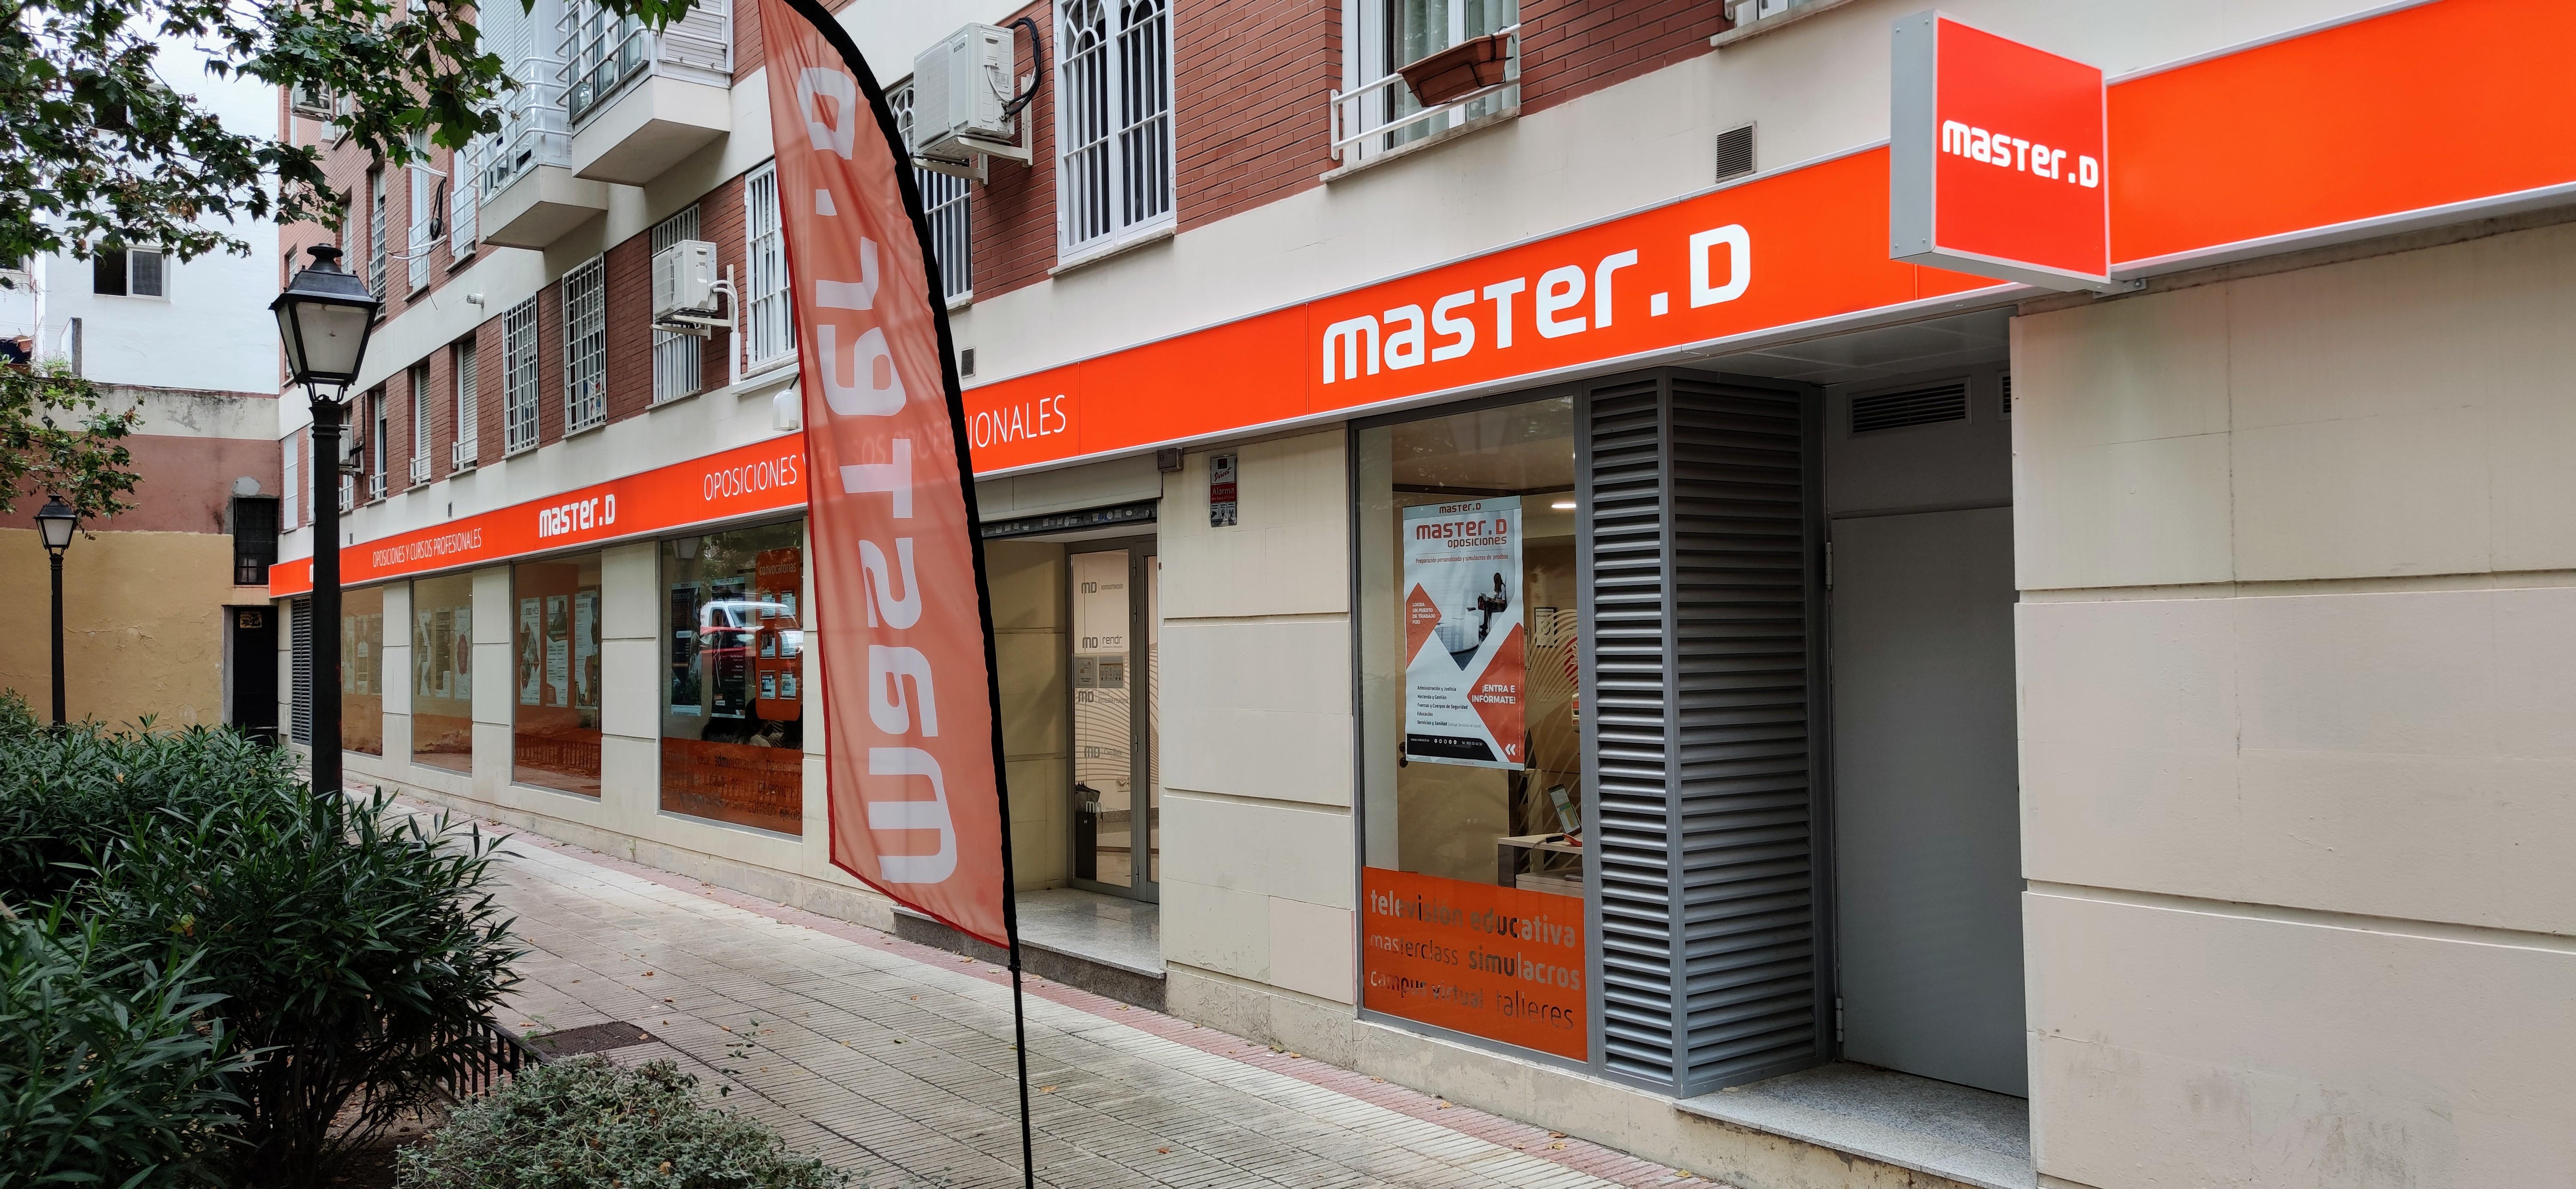 MasterD Acorcón